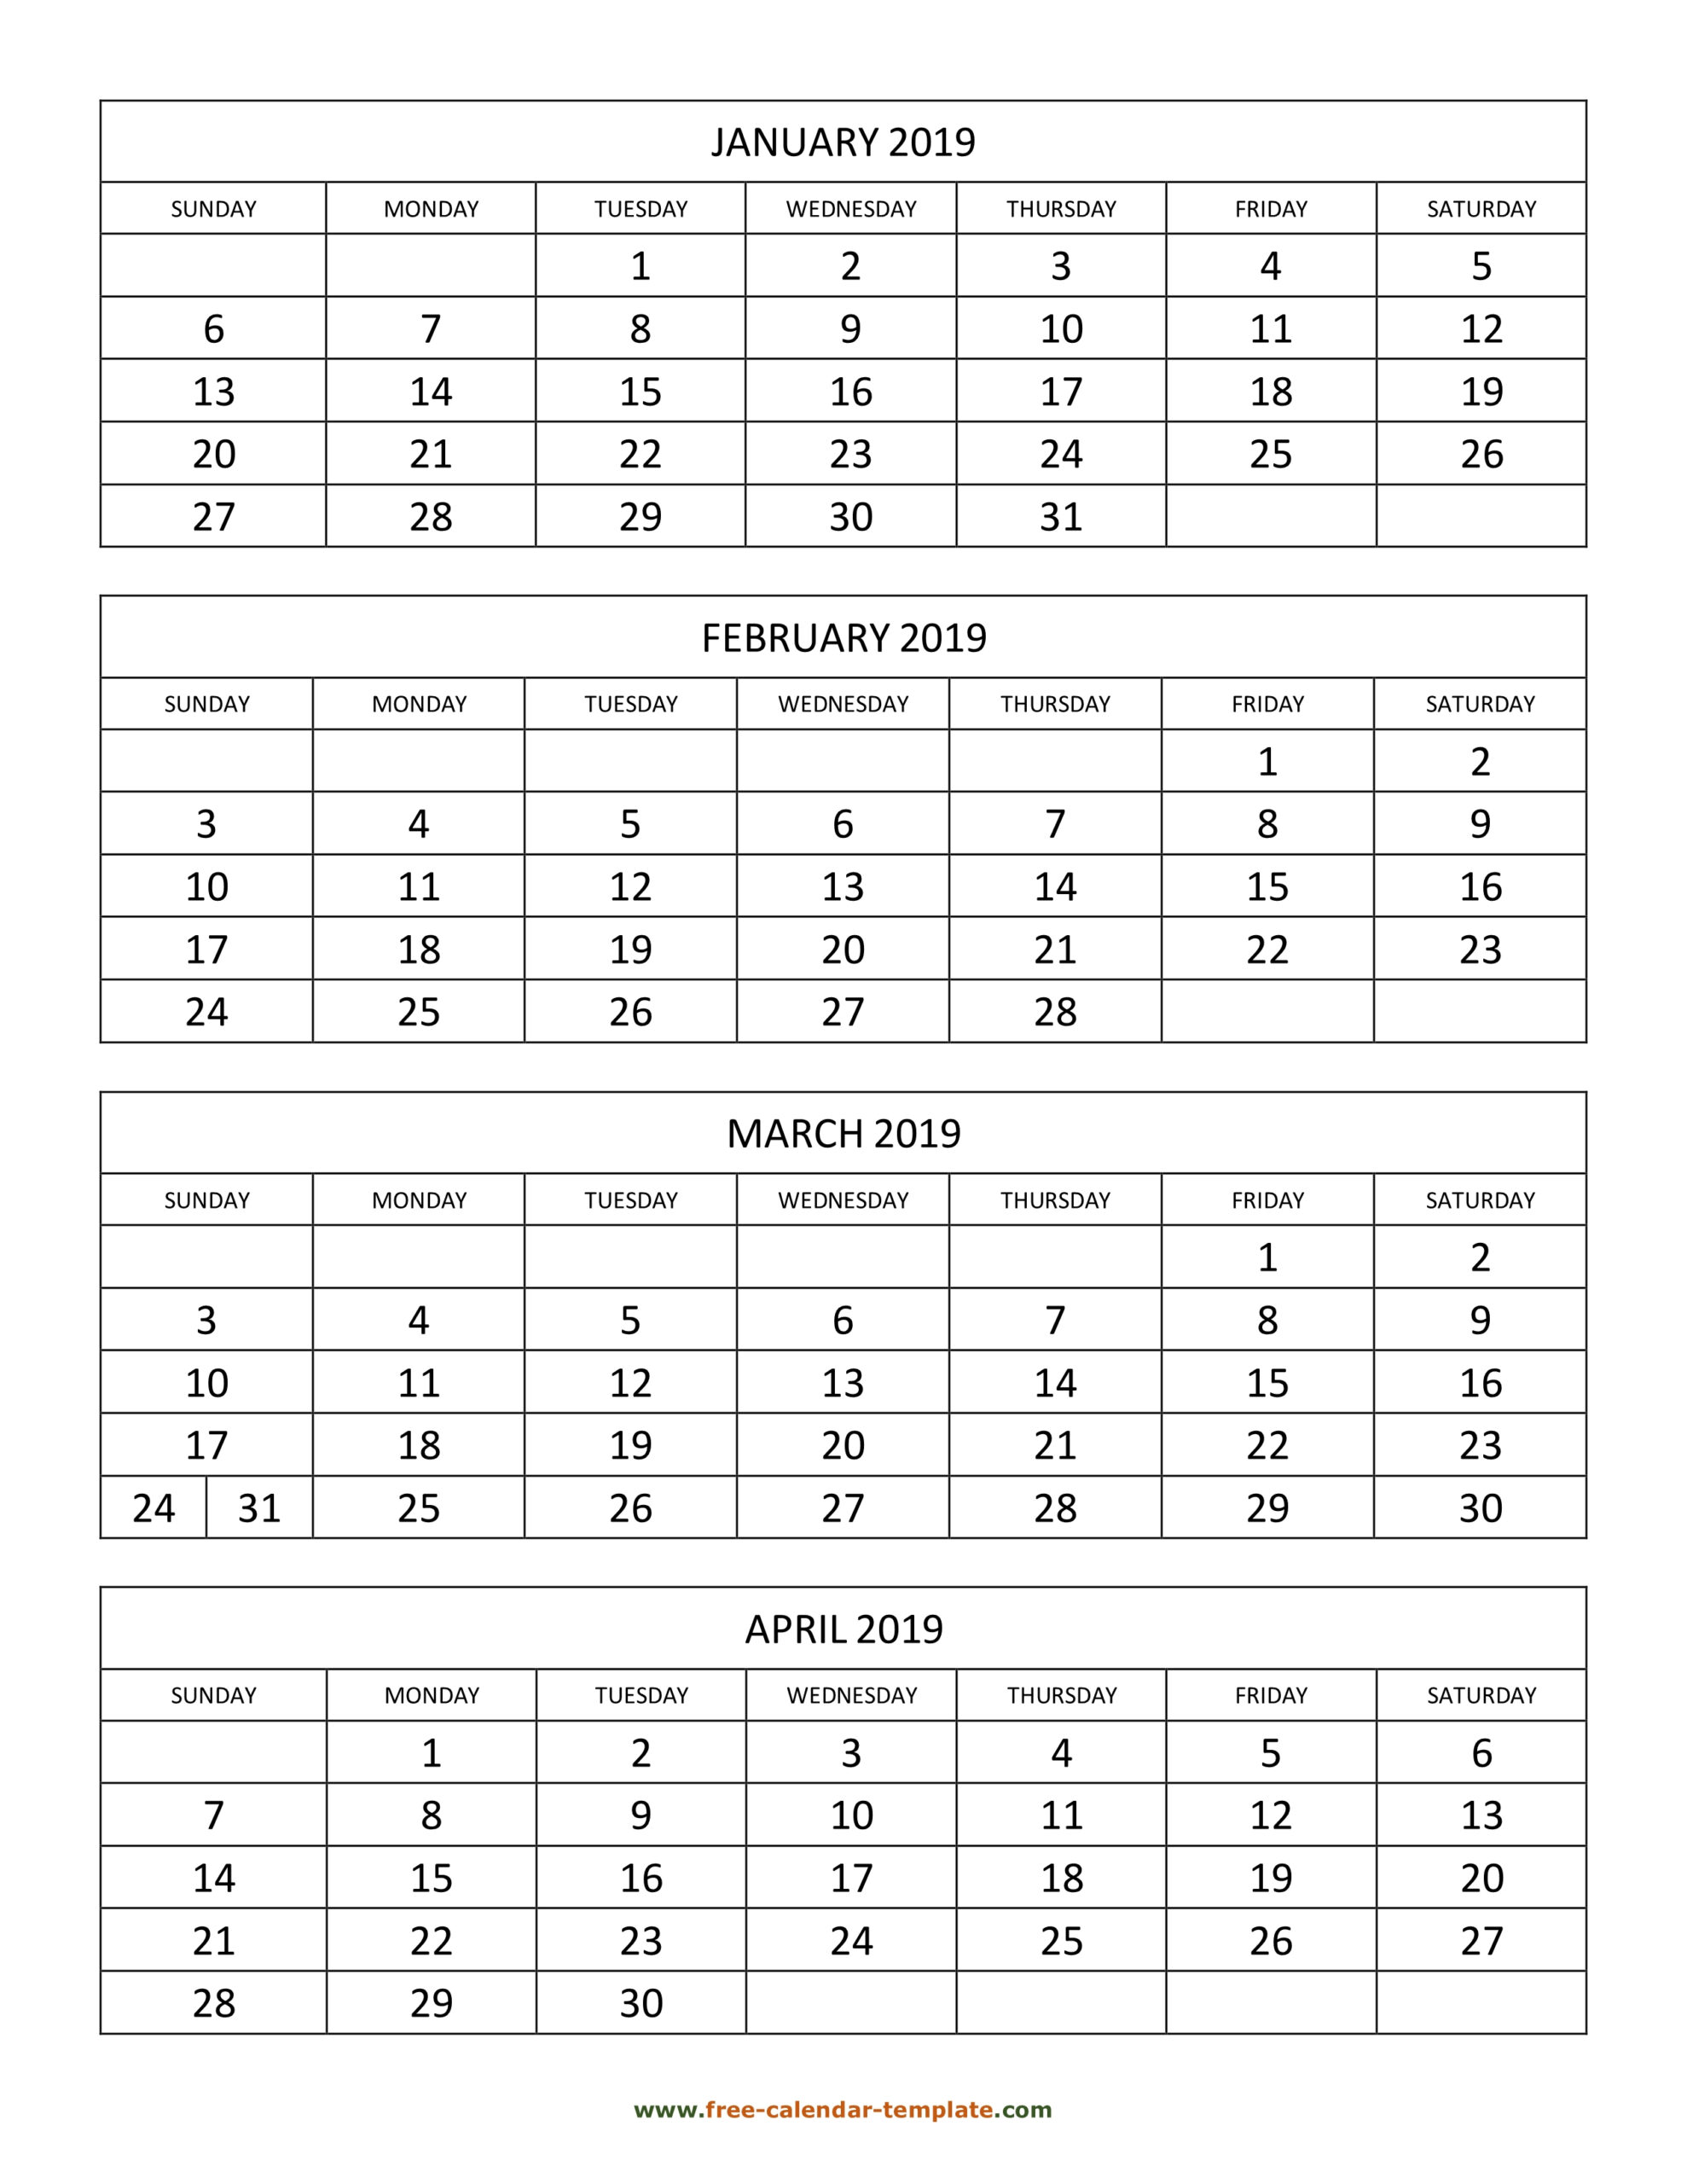 Monthly 2019 Calendar 4 Months Per Page (Vertical) | Free regarding Free Printable 4 Month Calendar